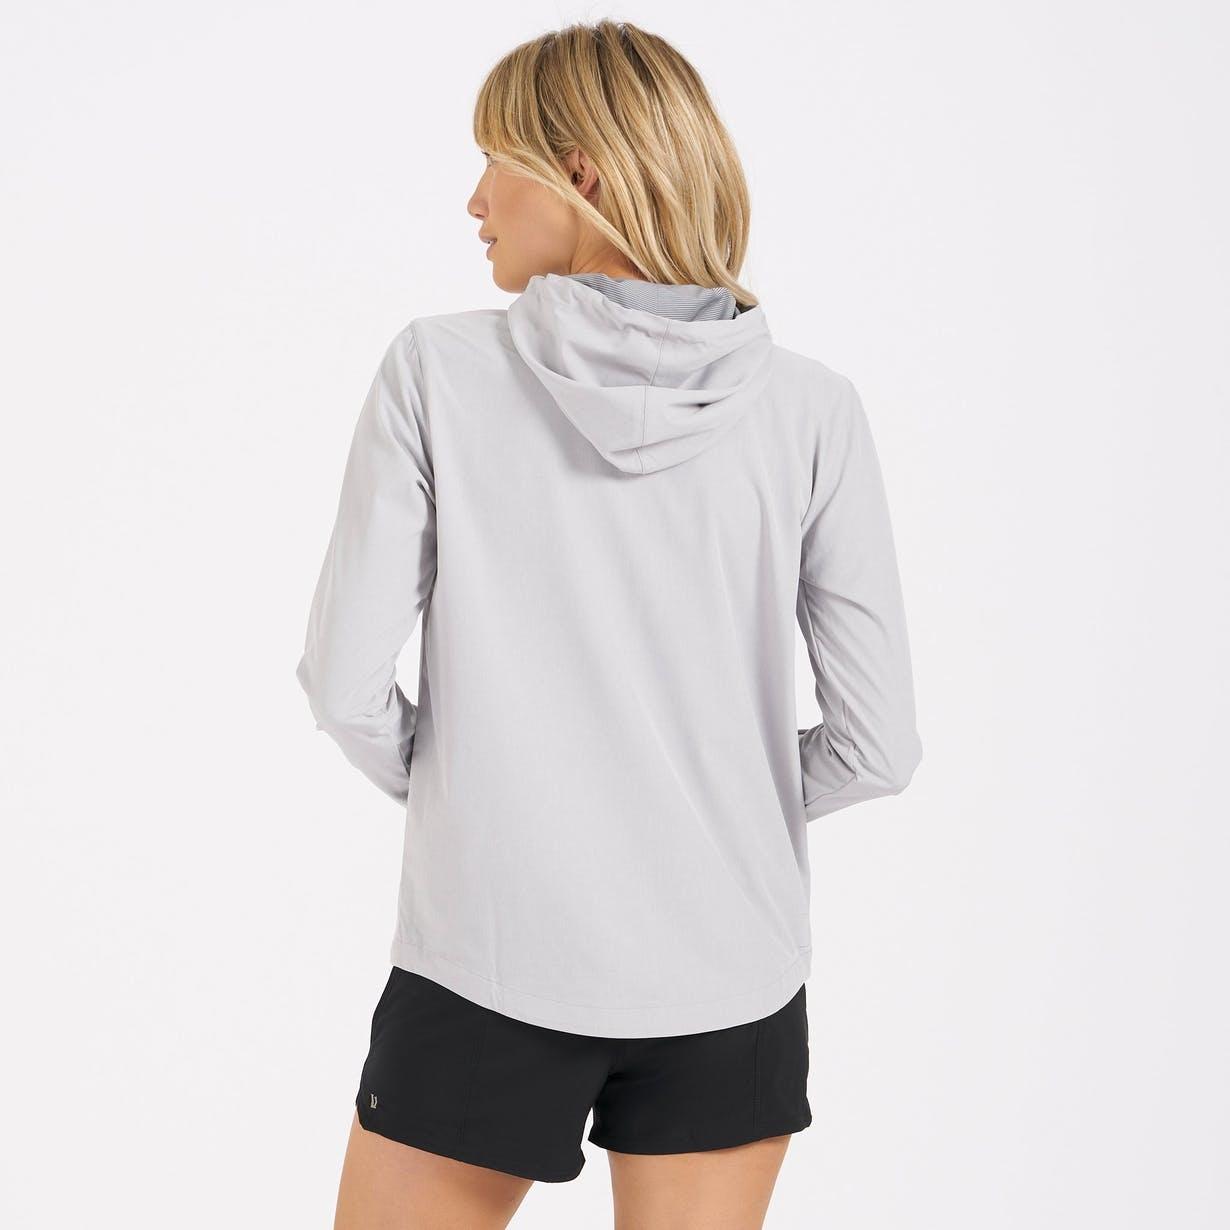 Vuori Women's Outdoor Trainer Shell